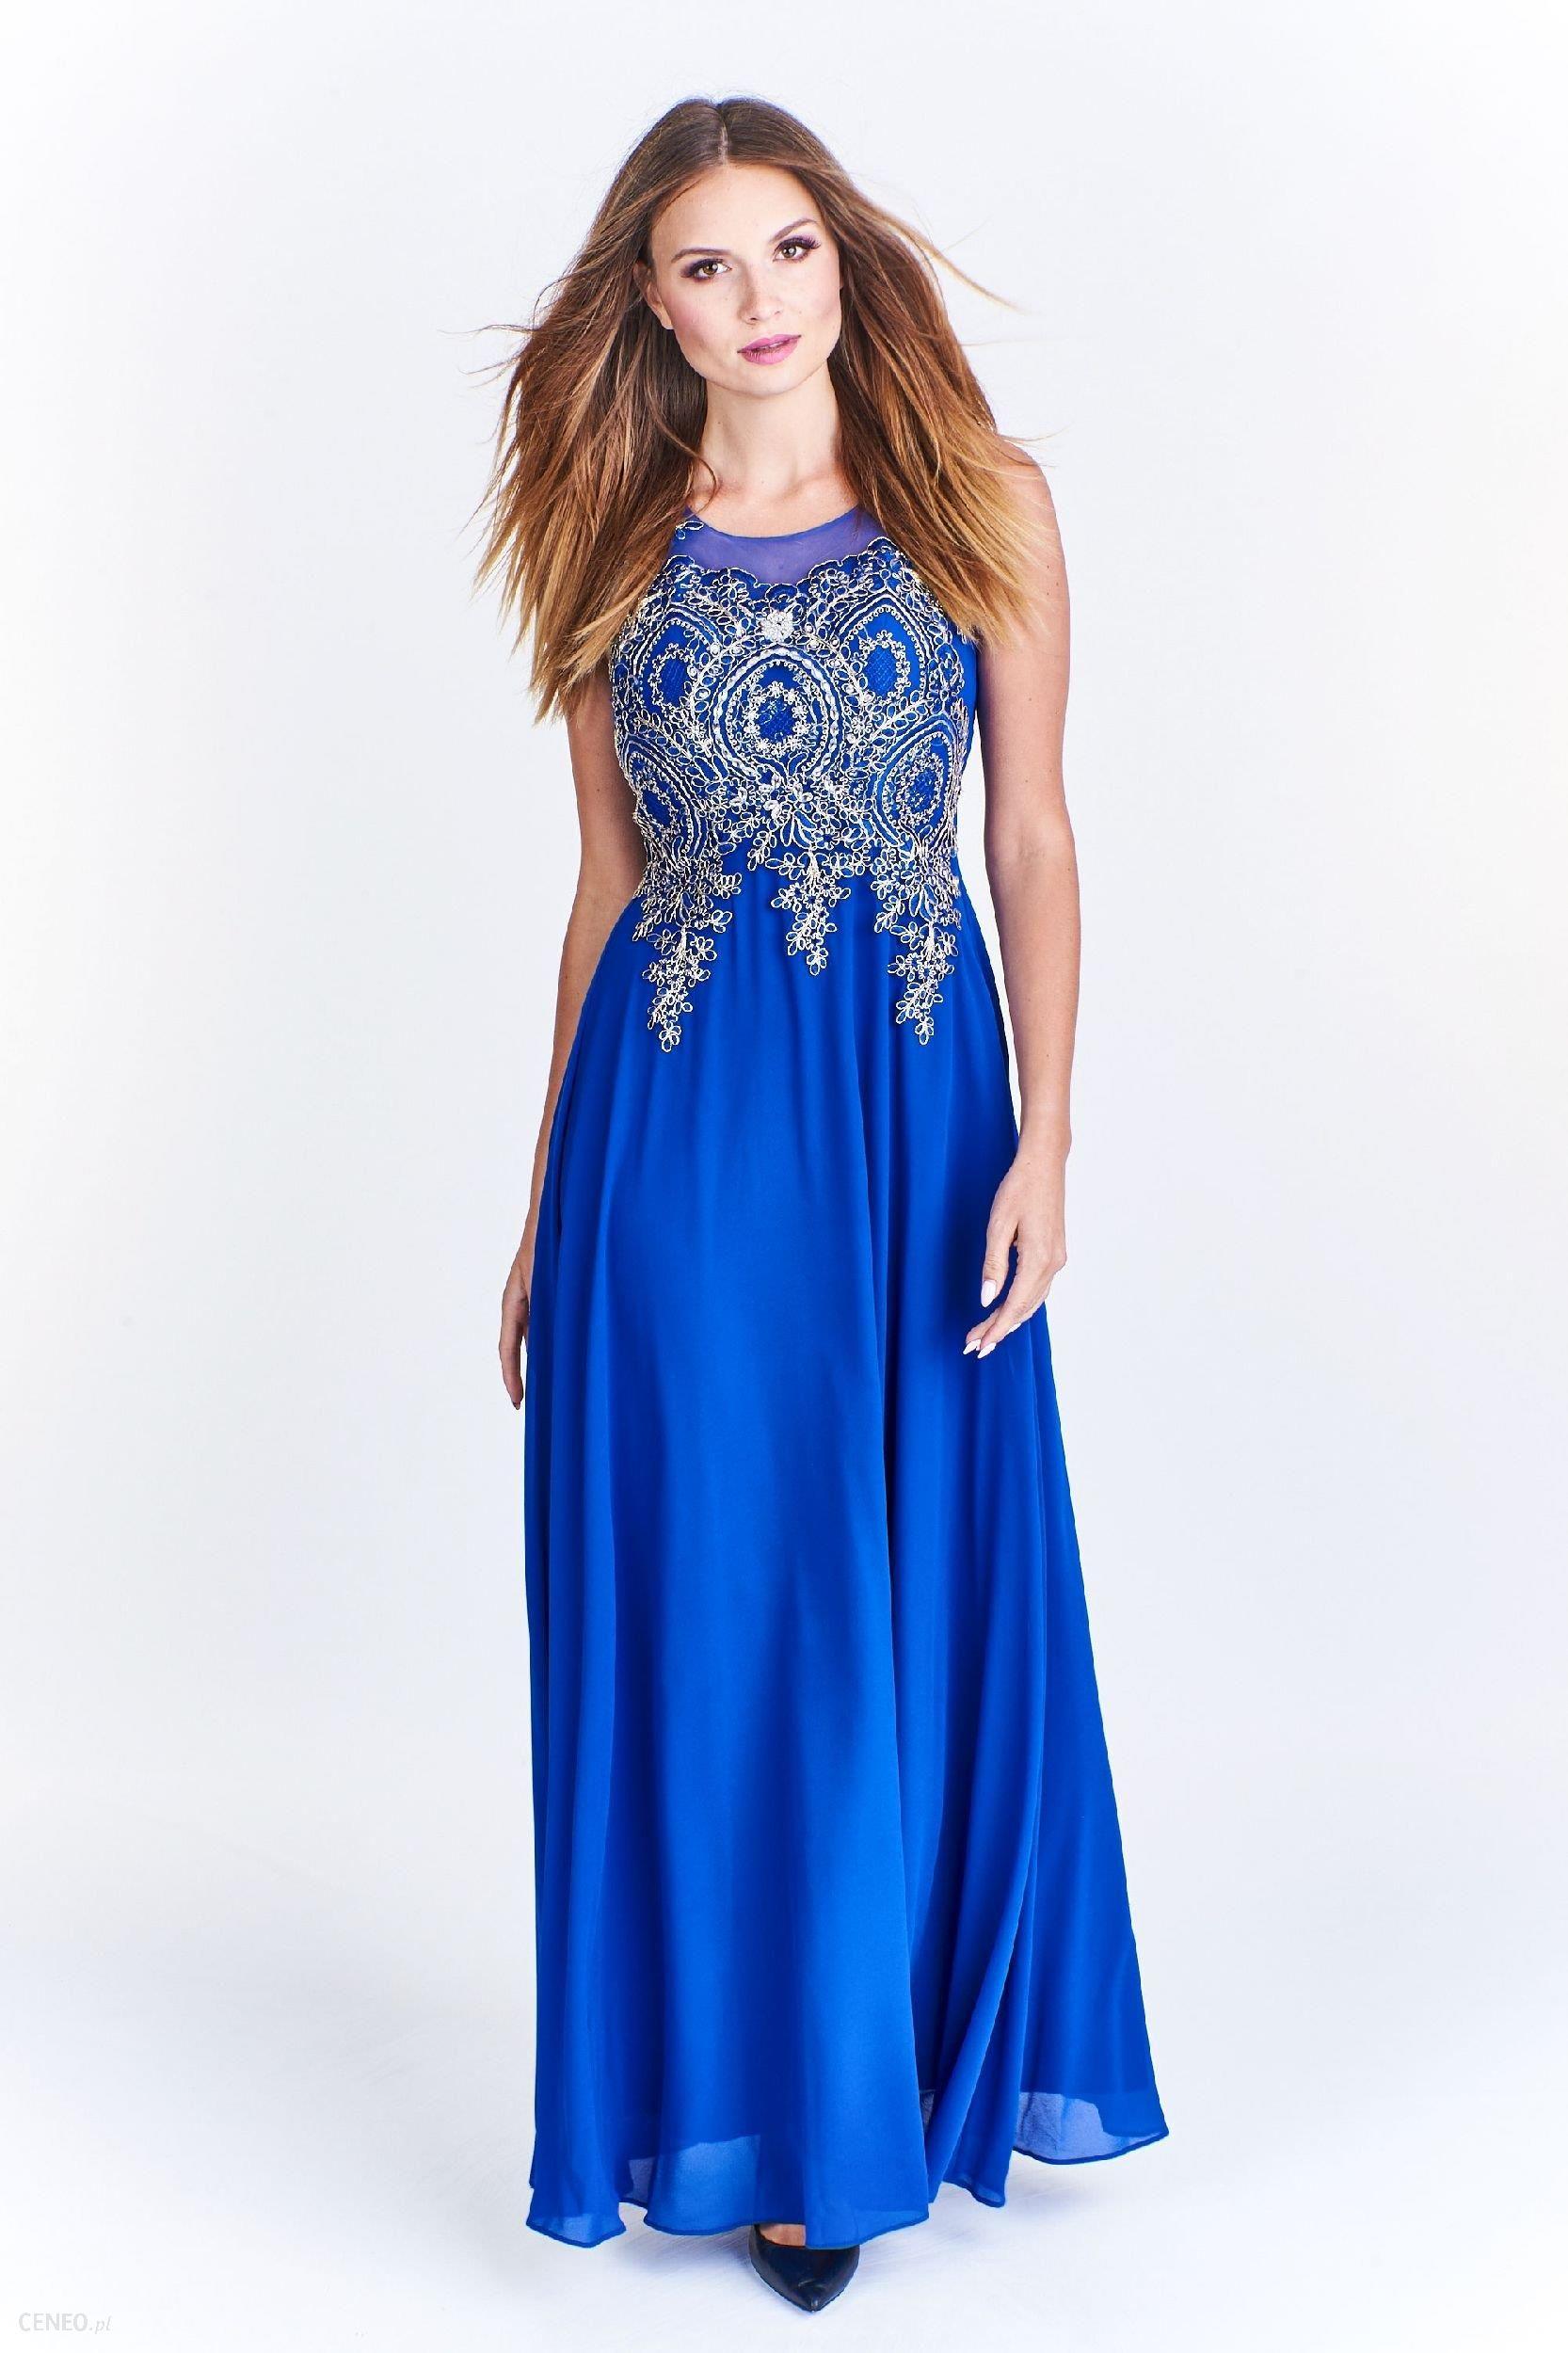 9103ba5b89 Ptak Moda Elegancka sukienka maxi M36684 szafirowa r. 38 - Ceny i ...